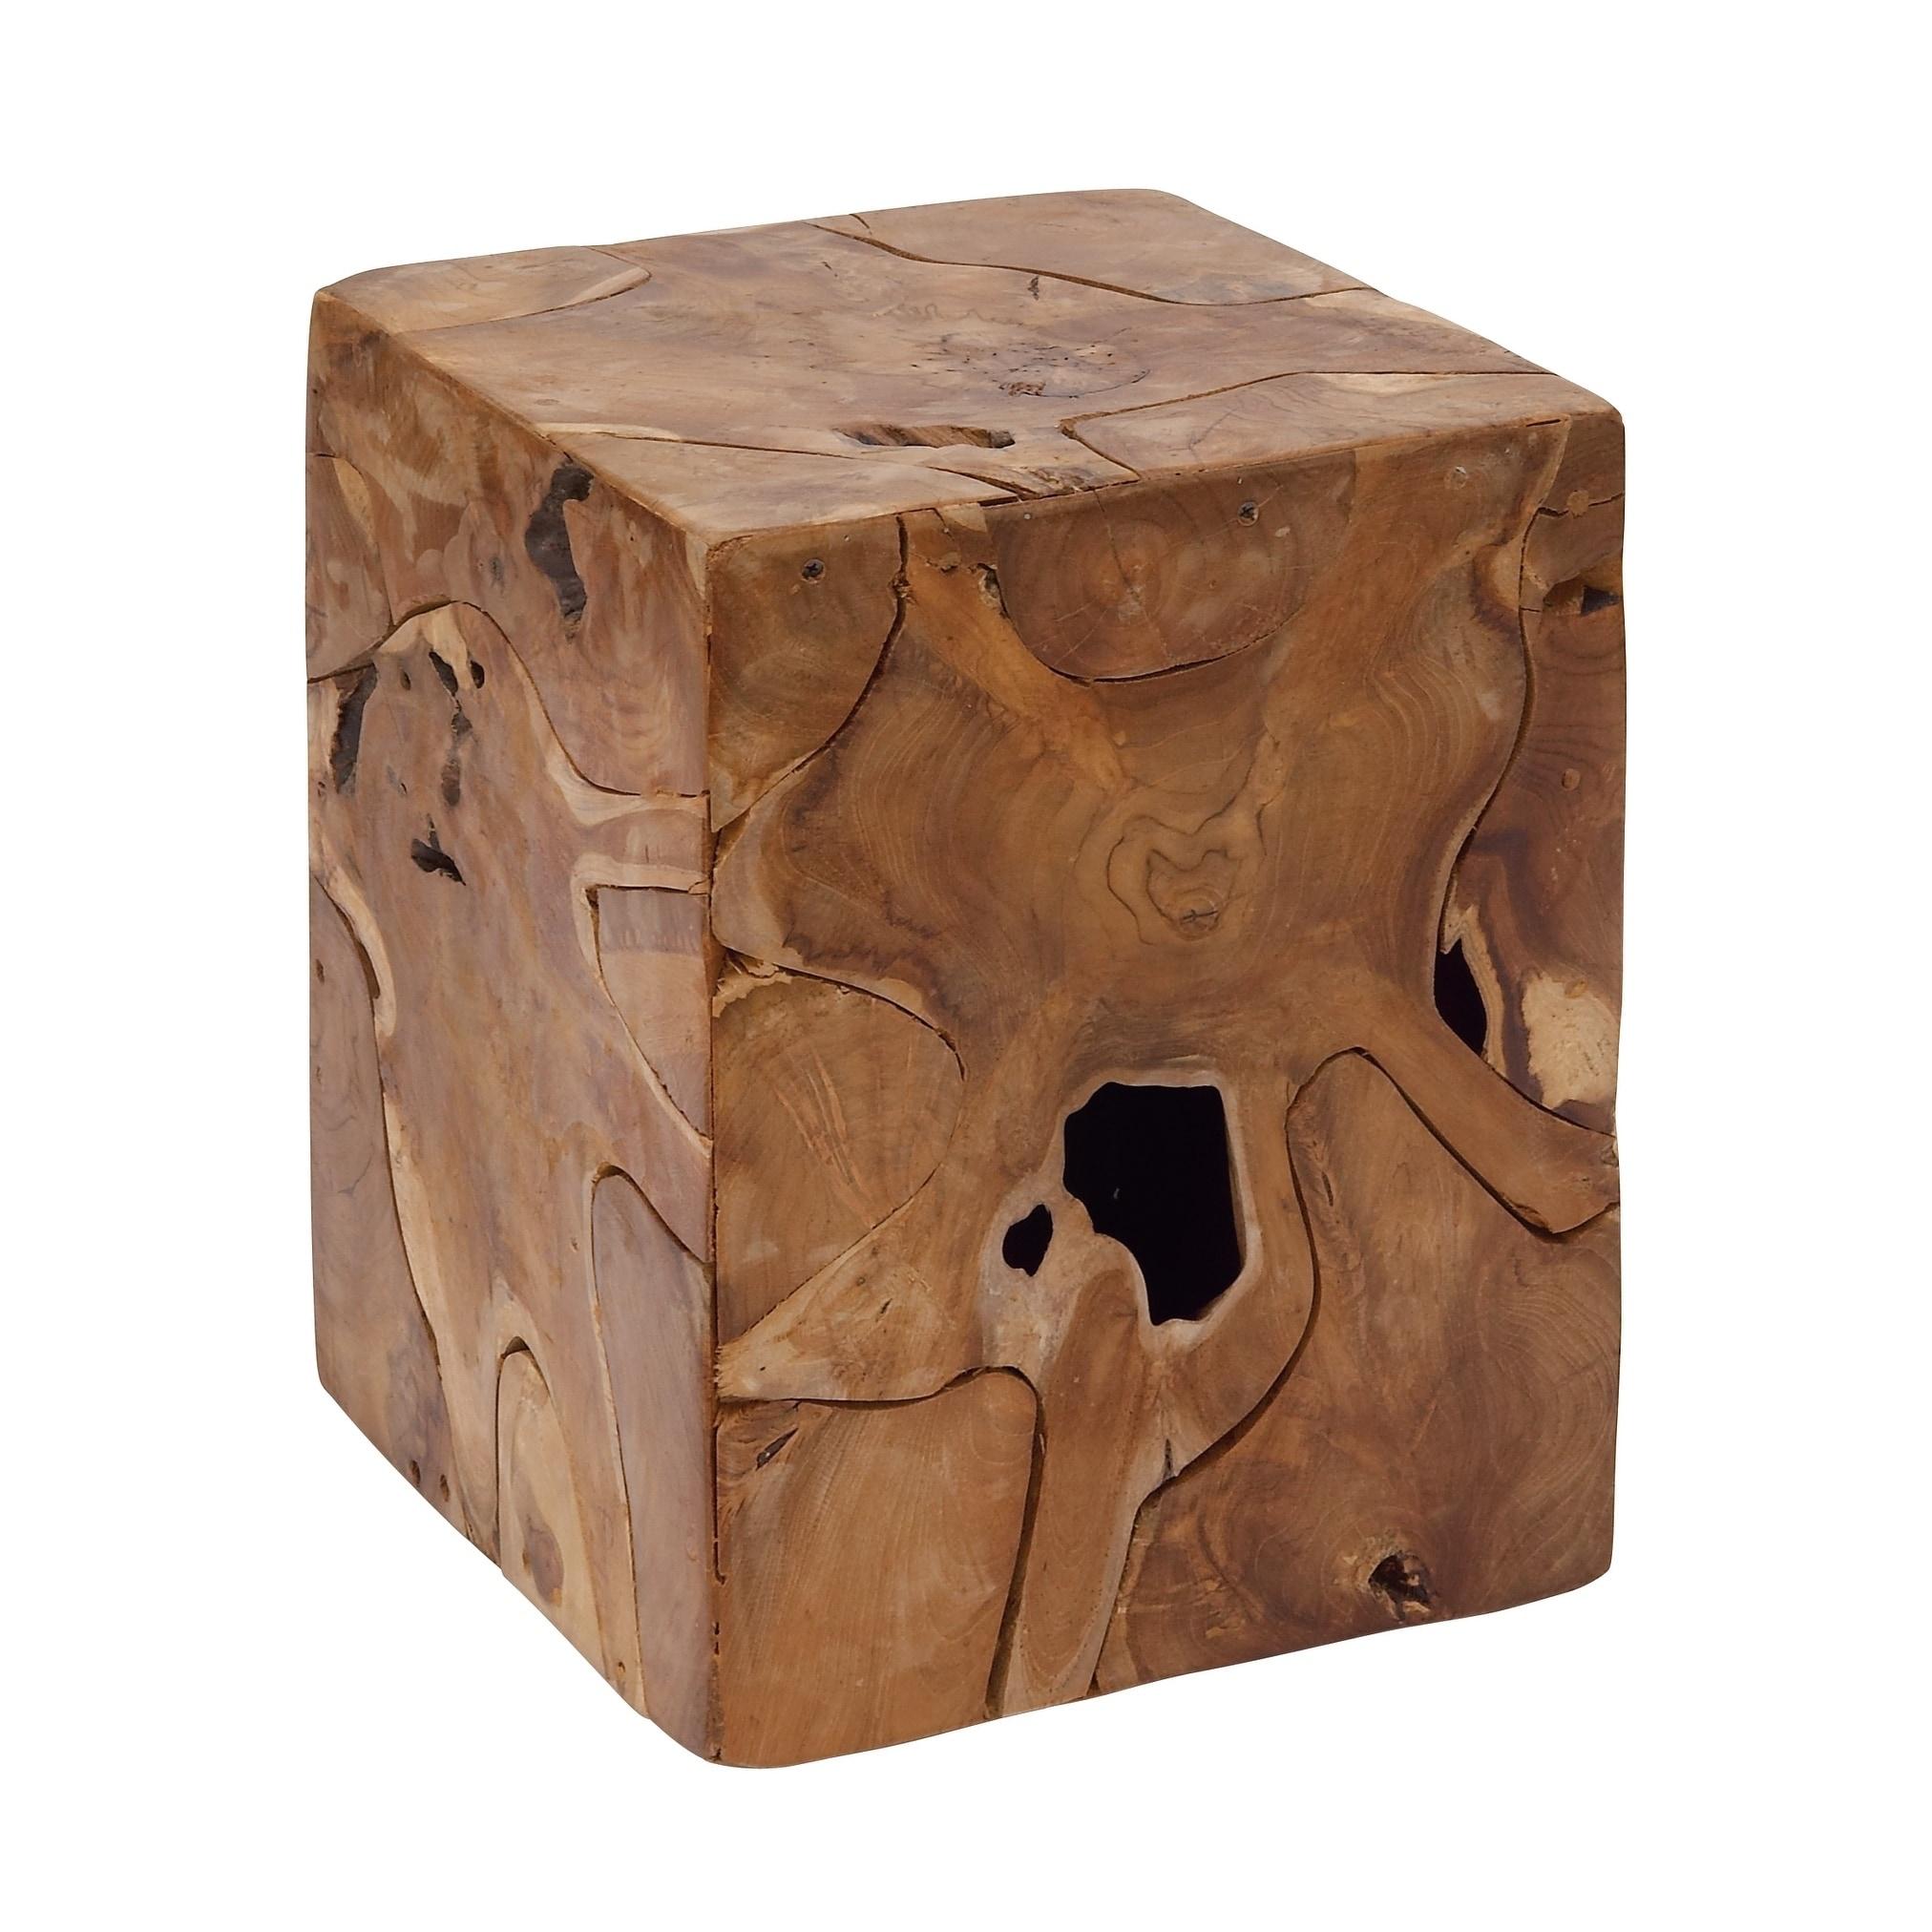 Shop Natural 18 x 14 Inch Brown Teak Wood Stool by Studio 350 - On ...